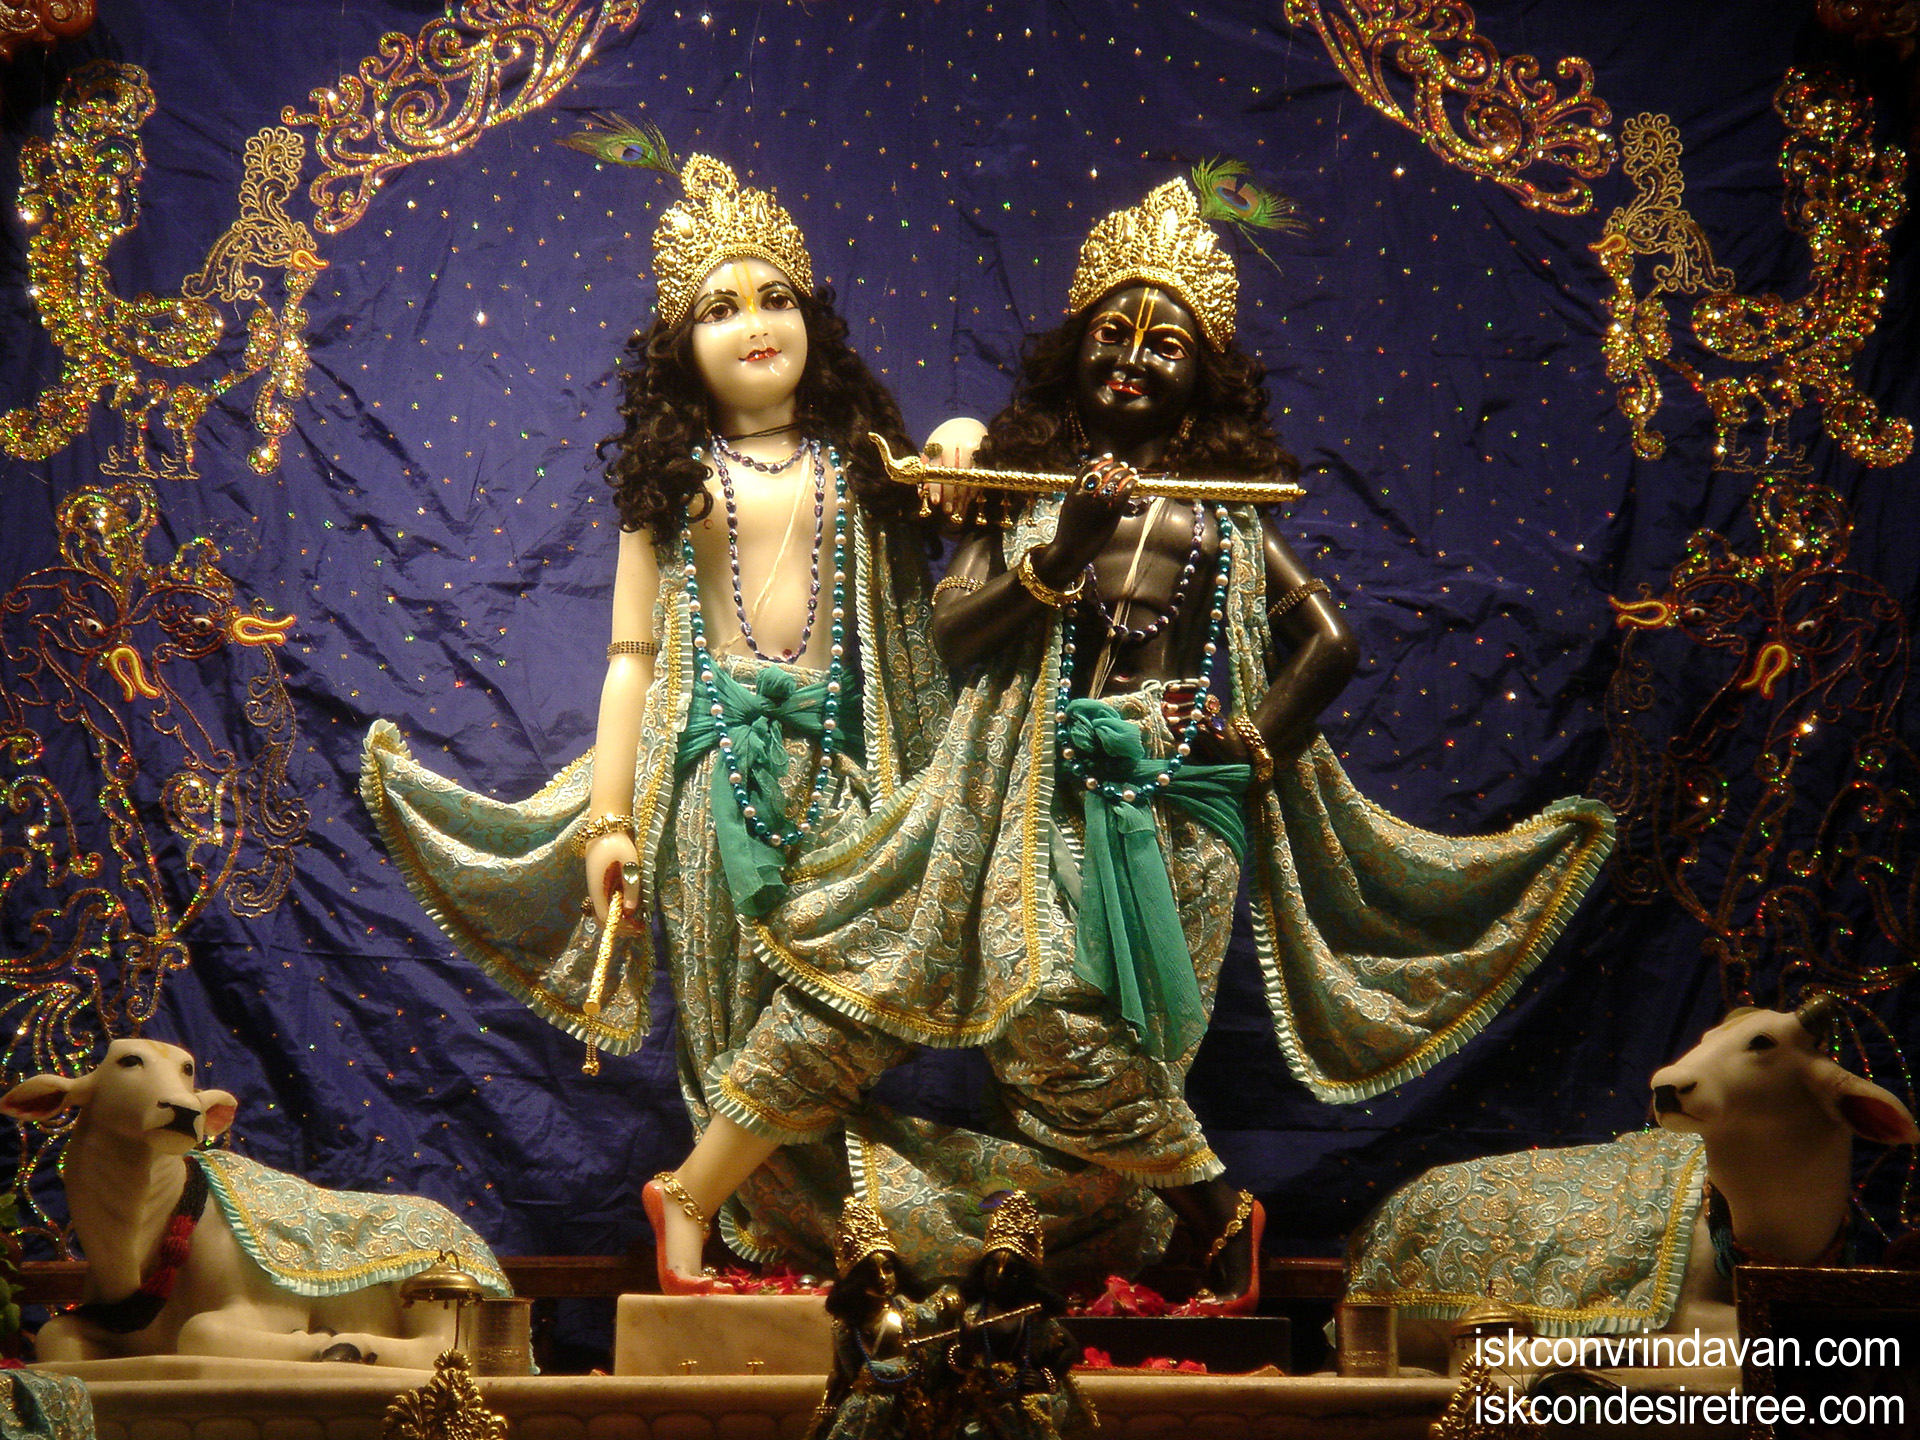 03ae145aa8 101-Sri_Sri_Krishna_Balaram_-_1920x1440